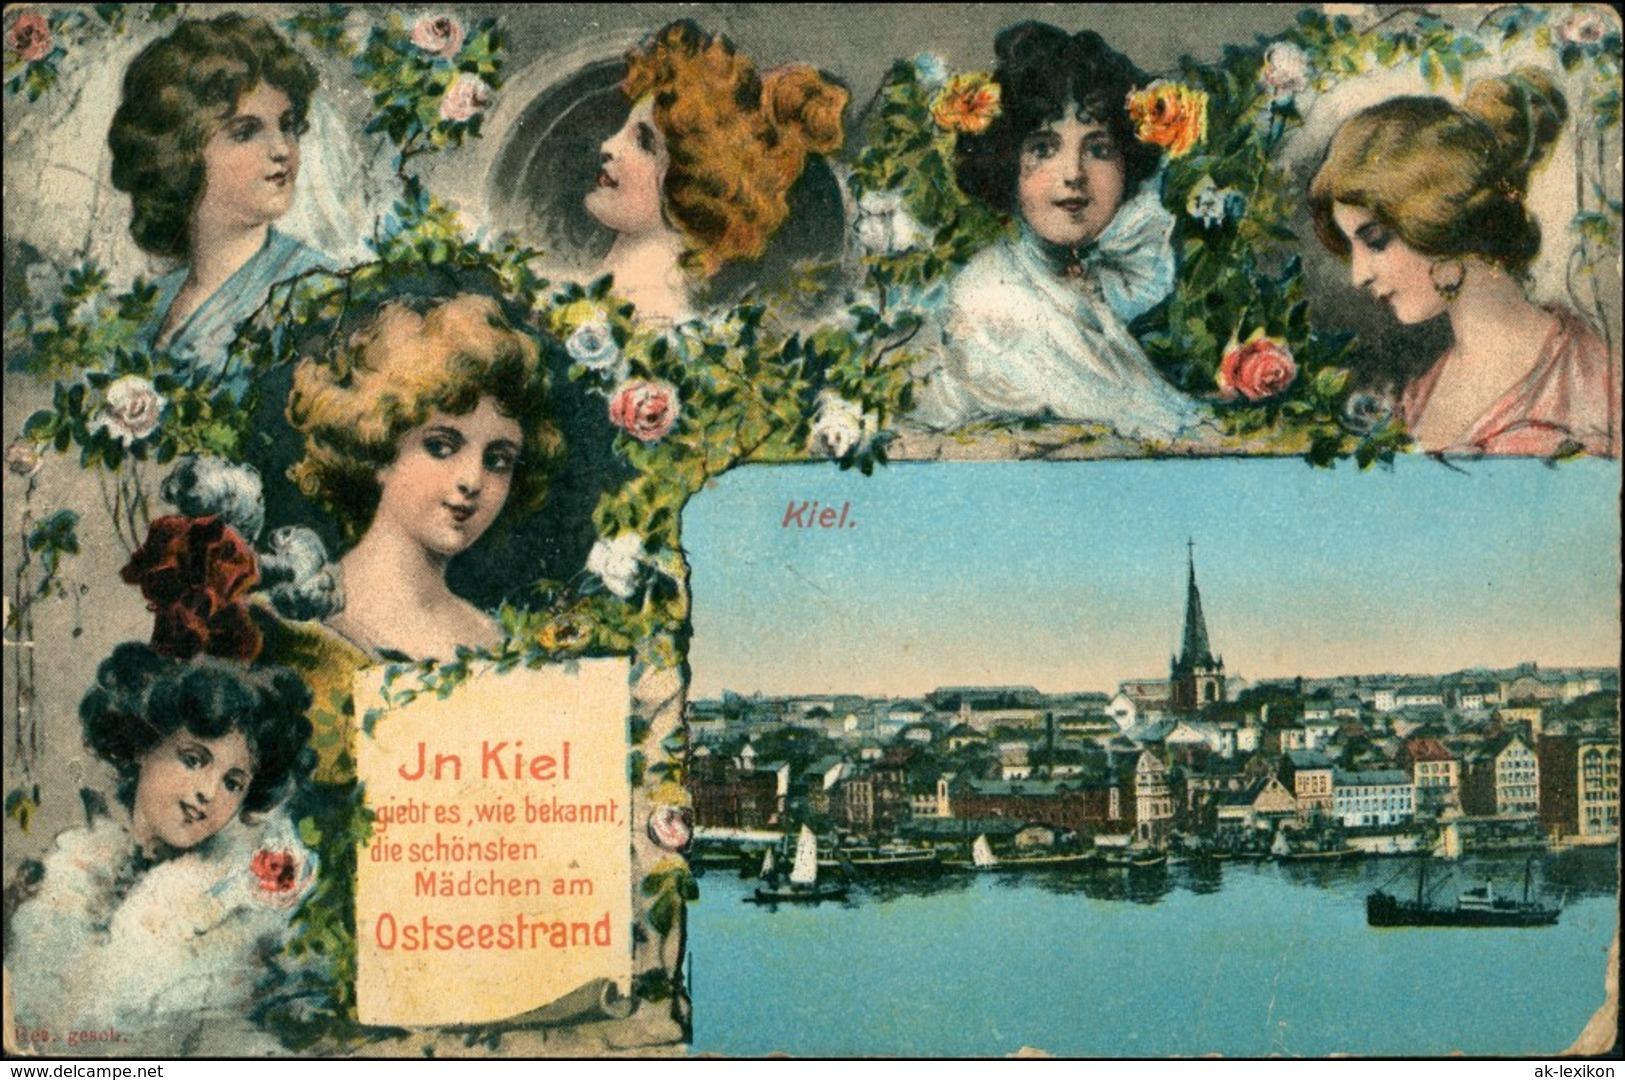 Ansichtskarte Kiel Frauenporträt: Totalansicht 1912 - Allemagne